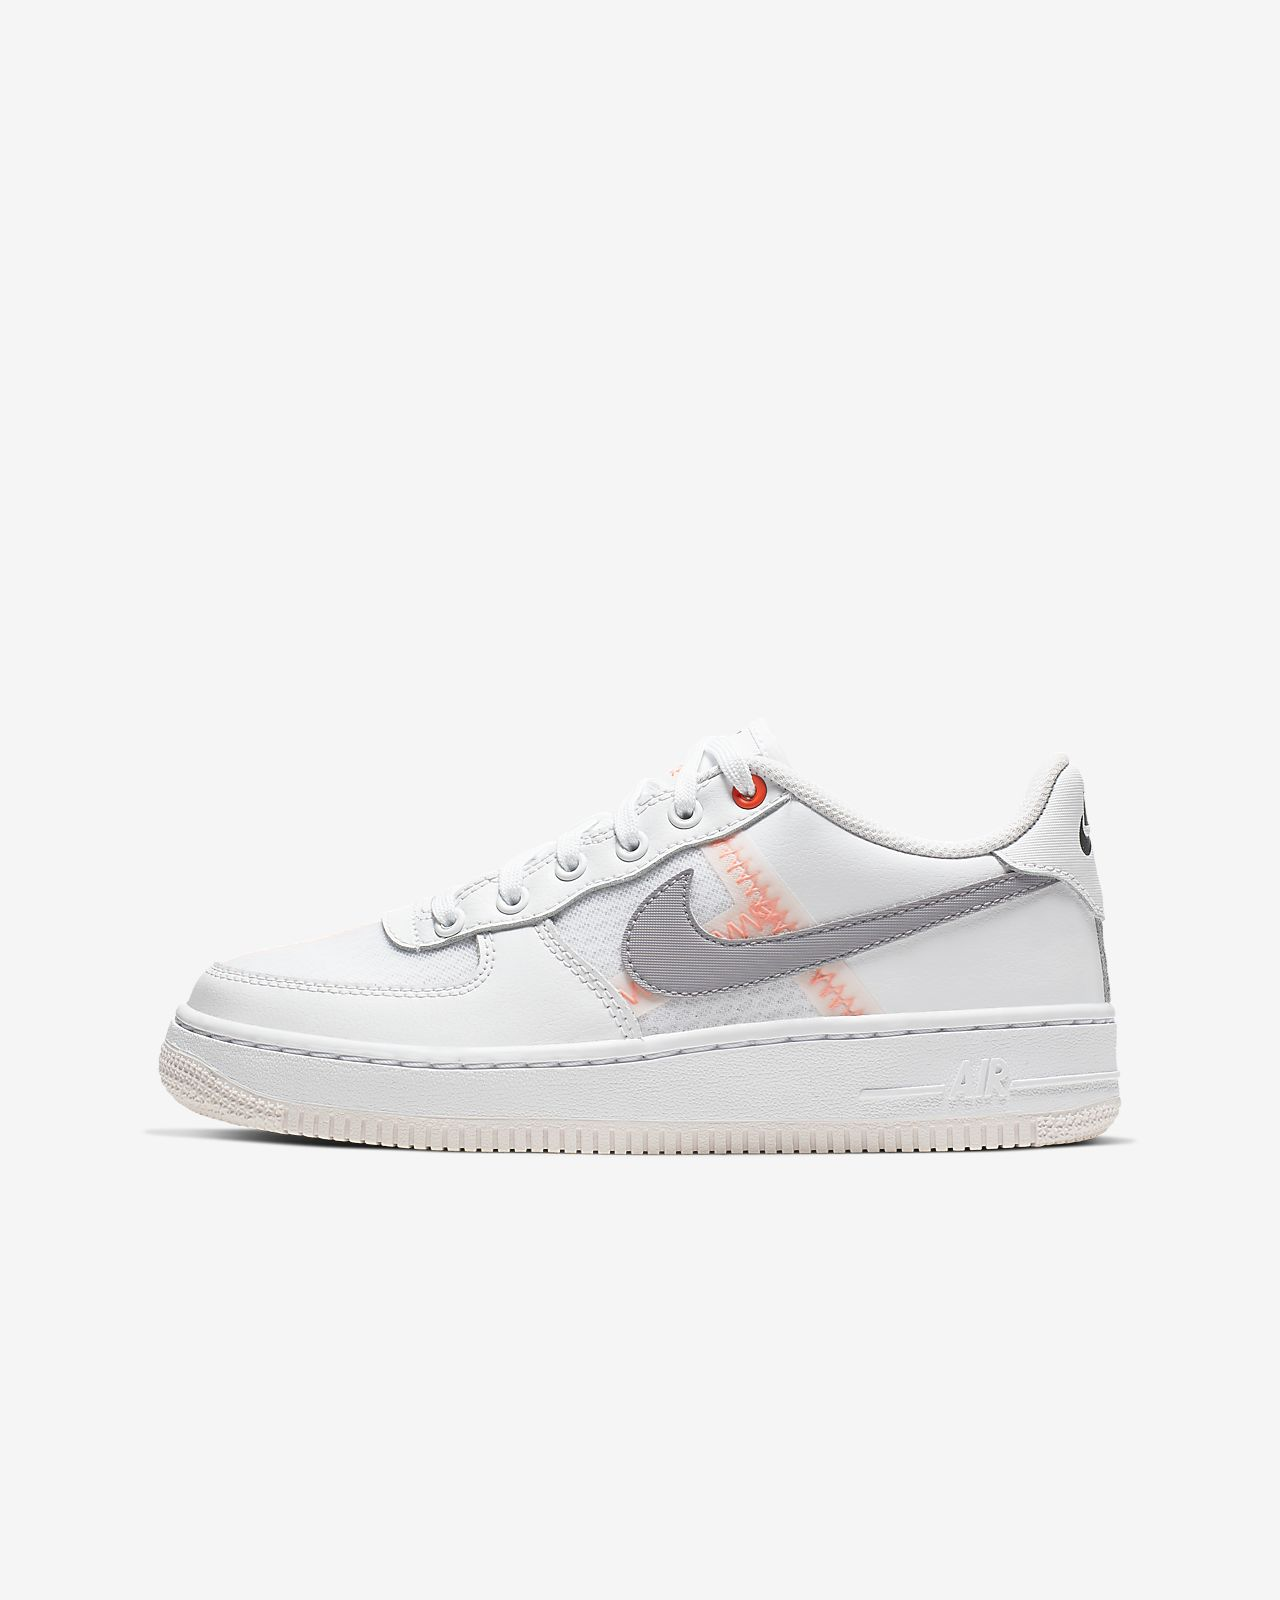 chaussure nike air force 1 lv8 nba pour enfant